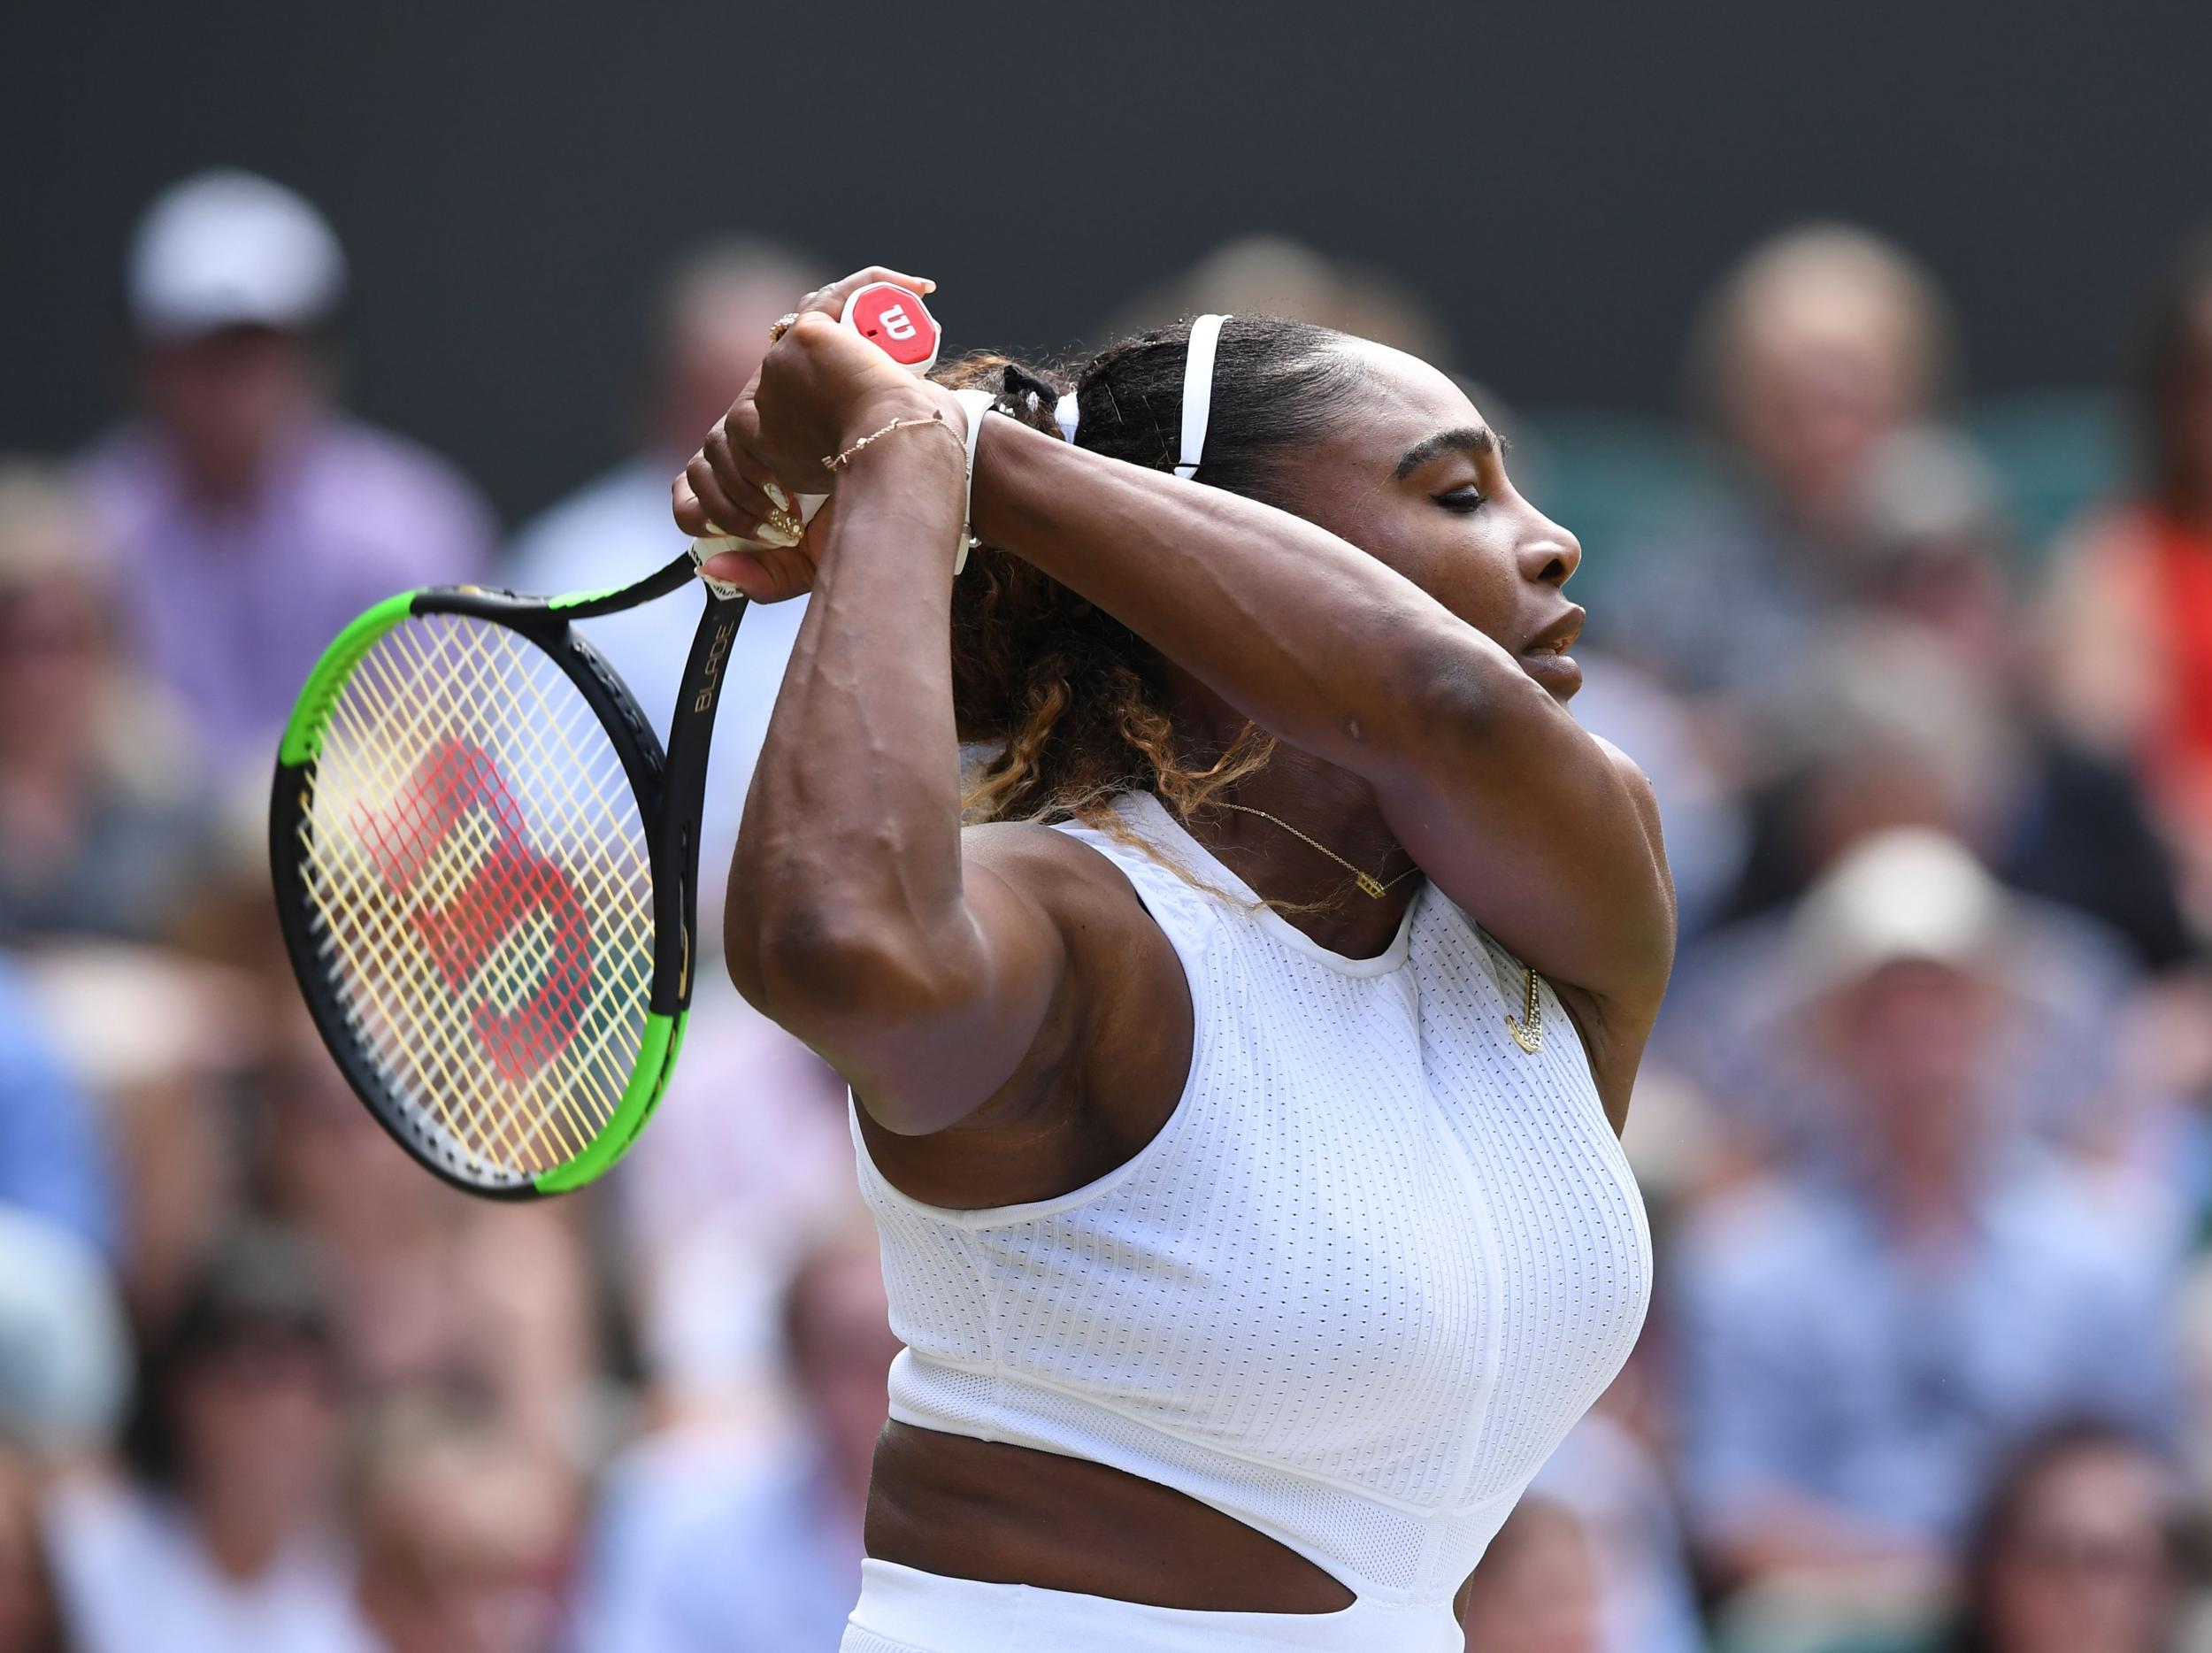 Wimbledon 2019 Live